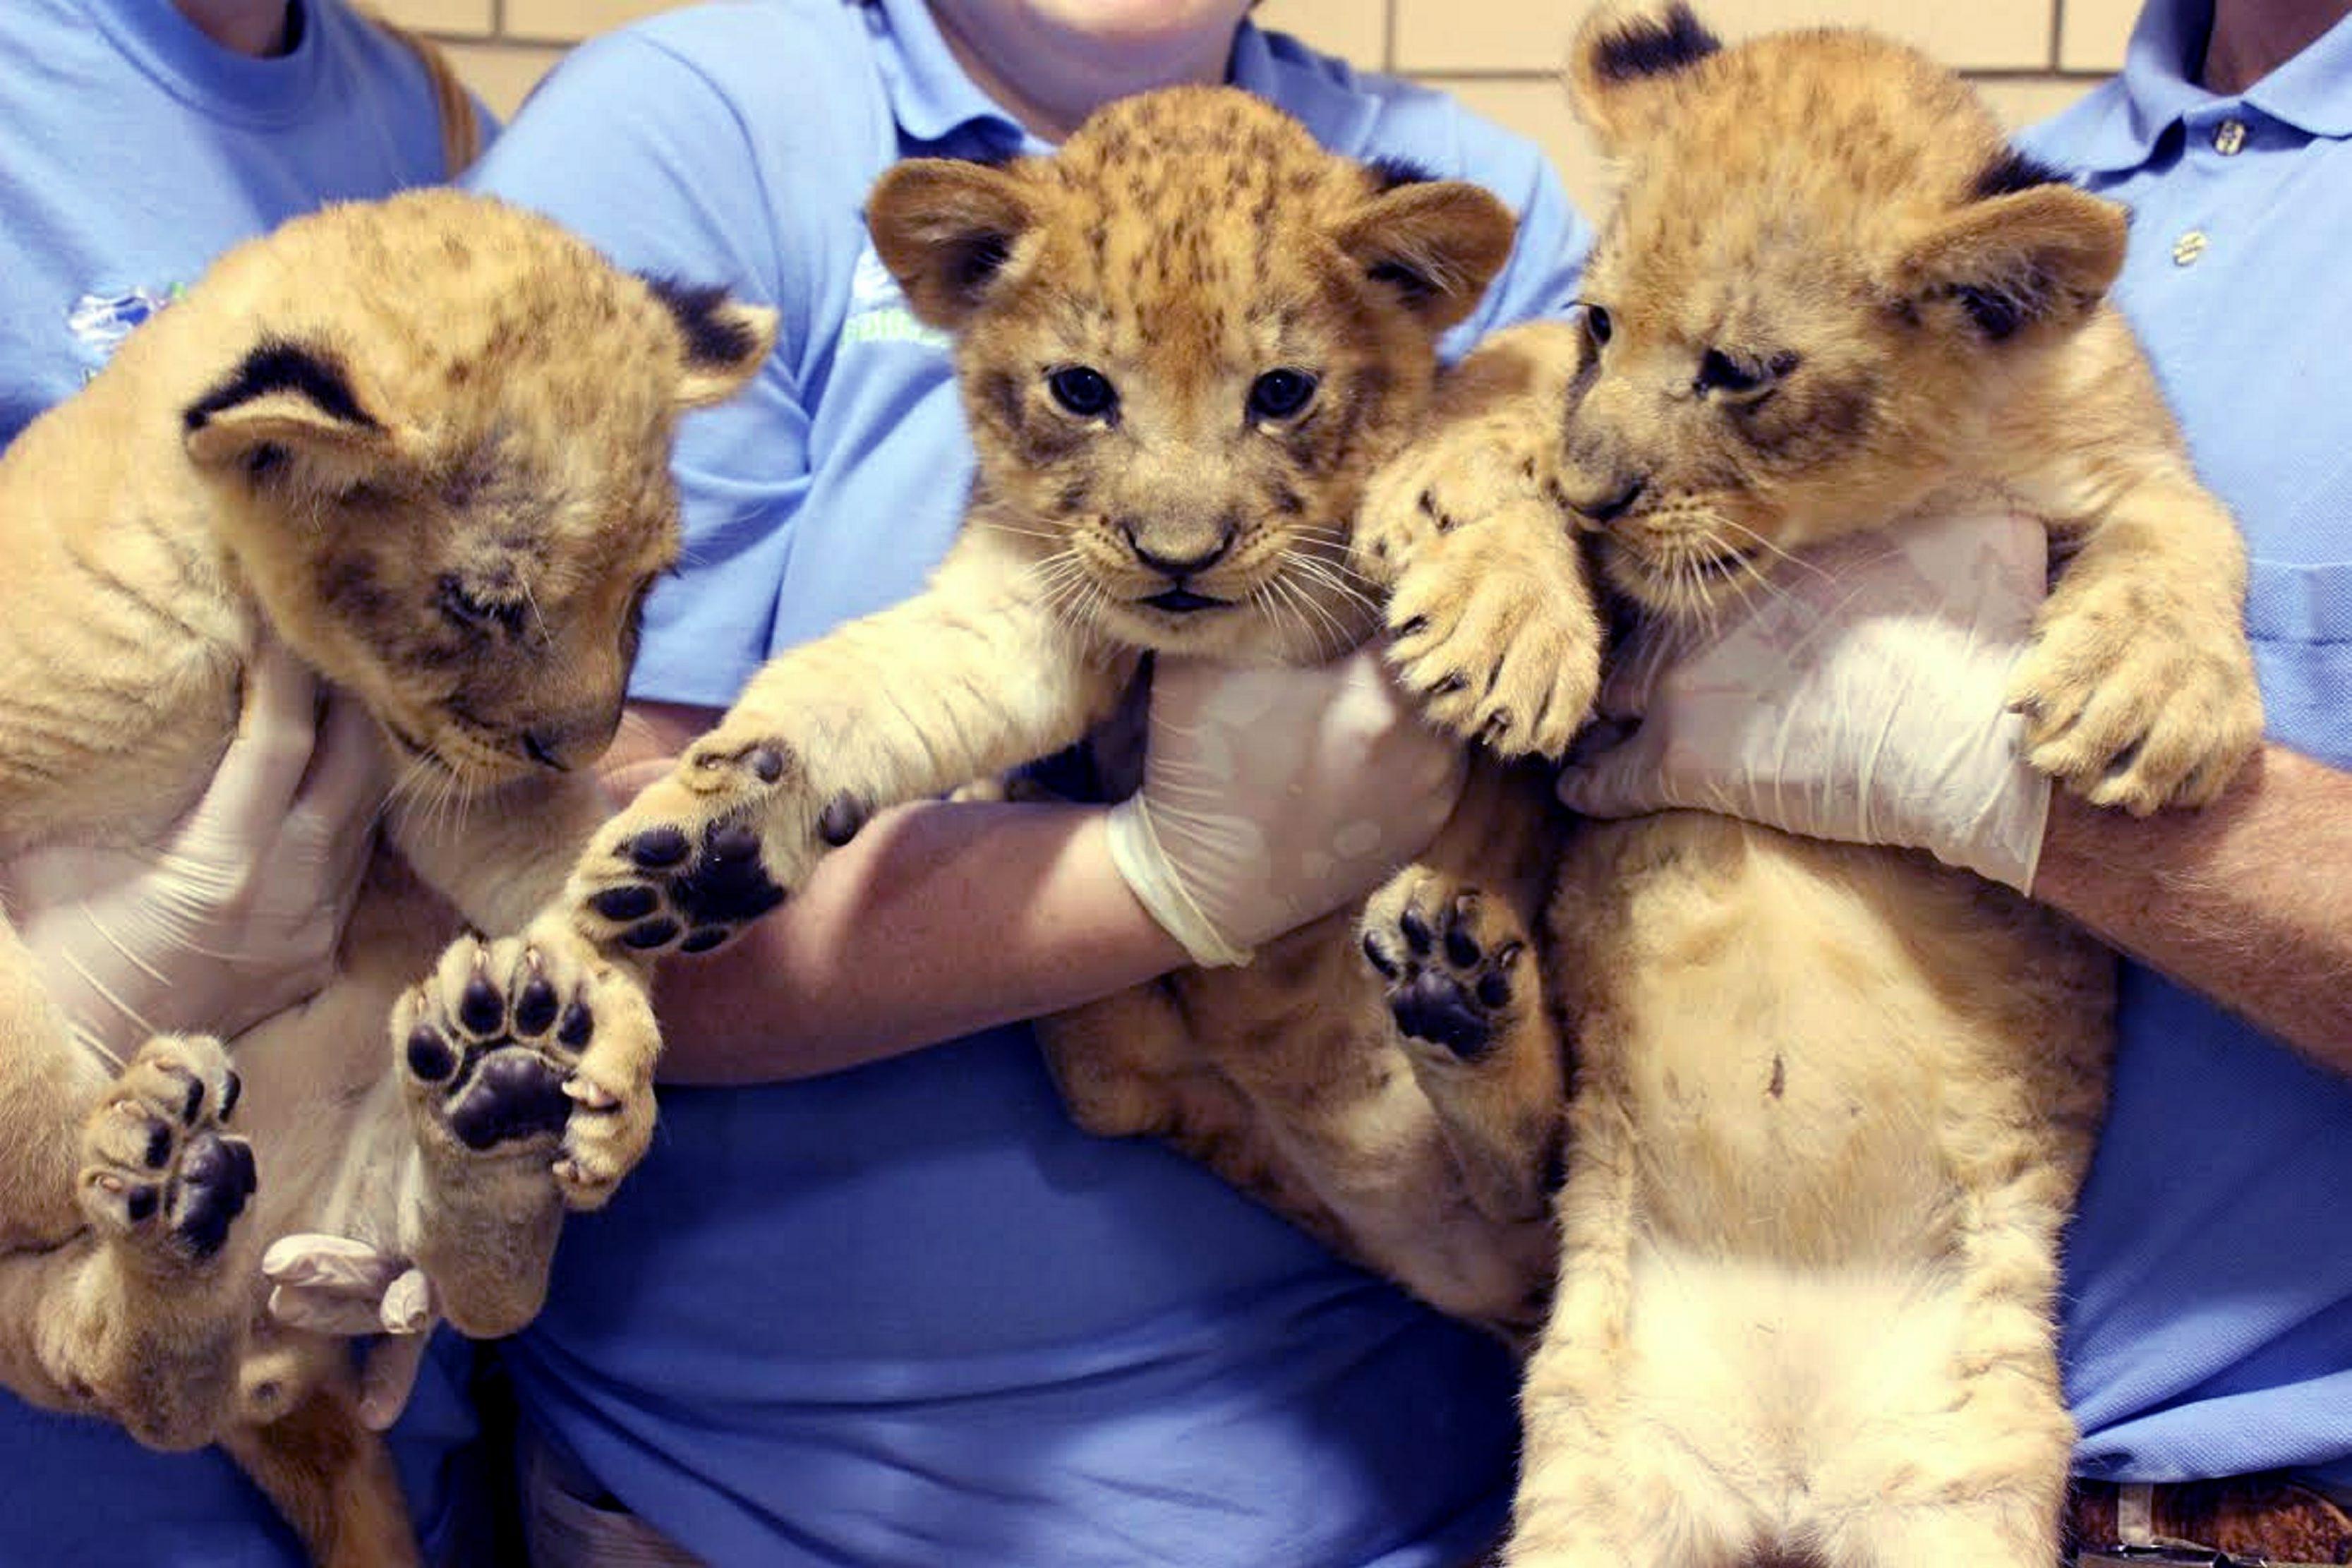 Three more lion cubs born at the Buffalo Zoo